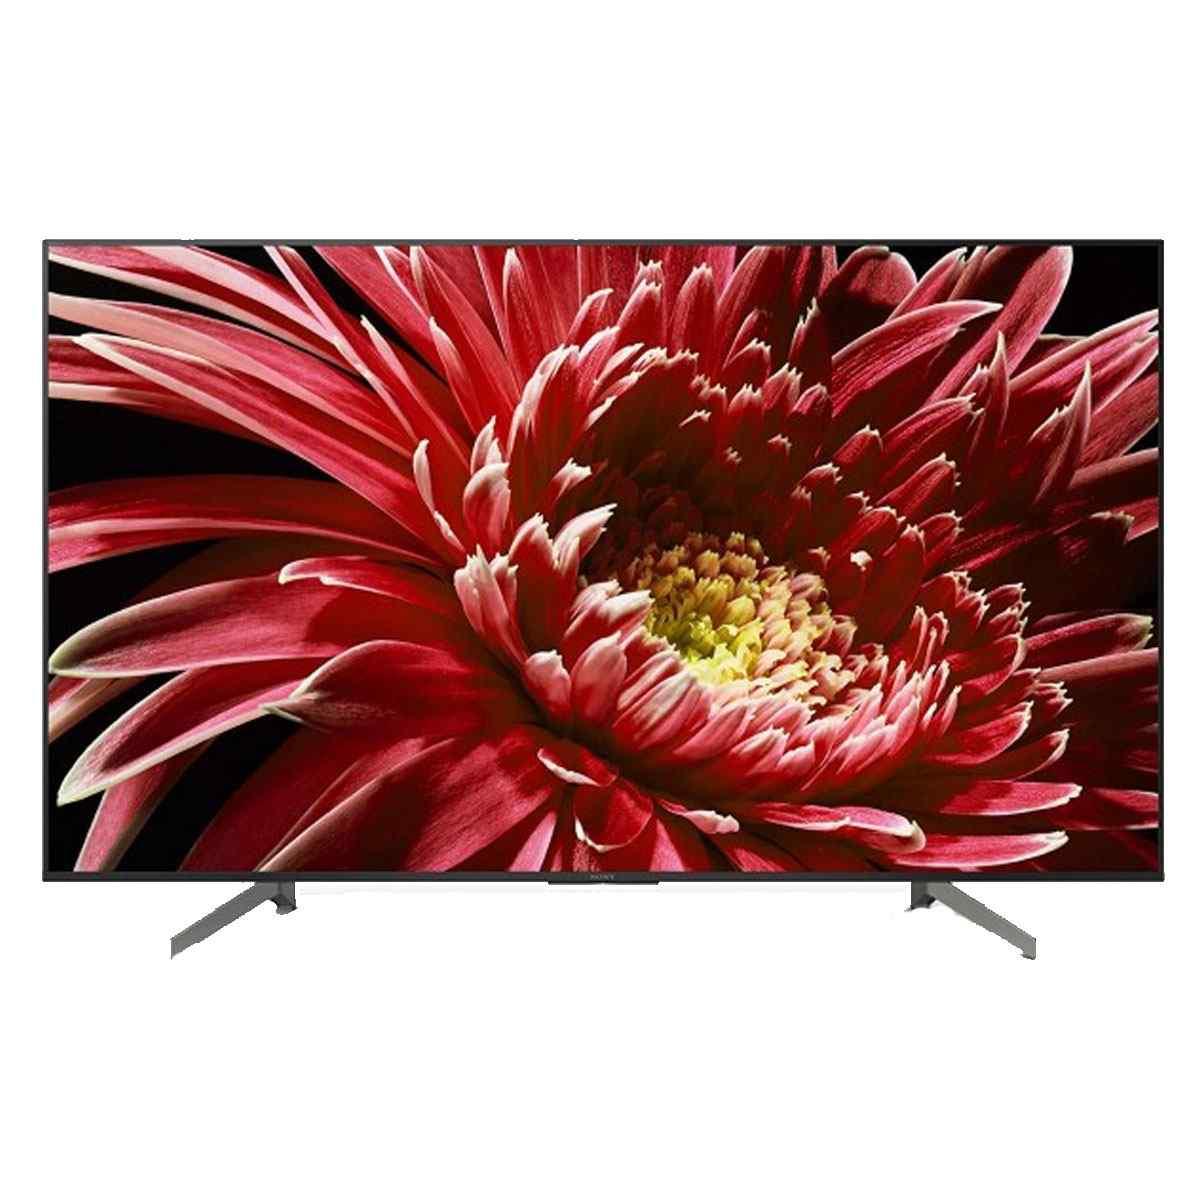 Sony Bravia 55 Inch FHD Smart LED TV (KD55X8500G)